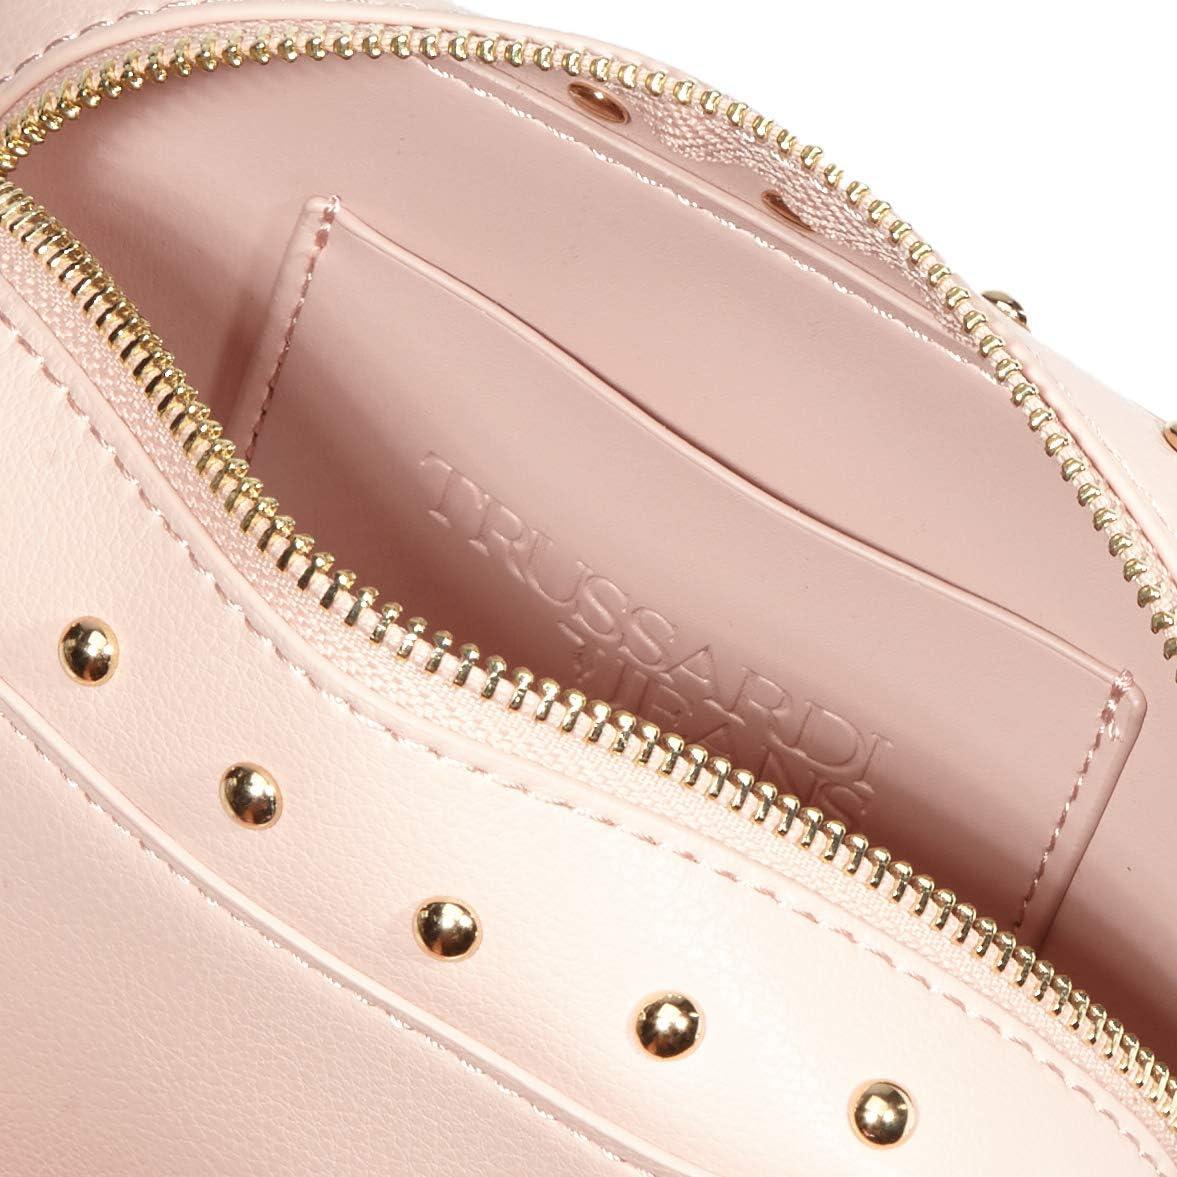 Trussardi Jeans, DAFNE CAMERA BAG ECOLEATHER MI Donna, NR P130